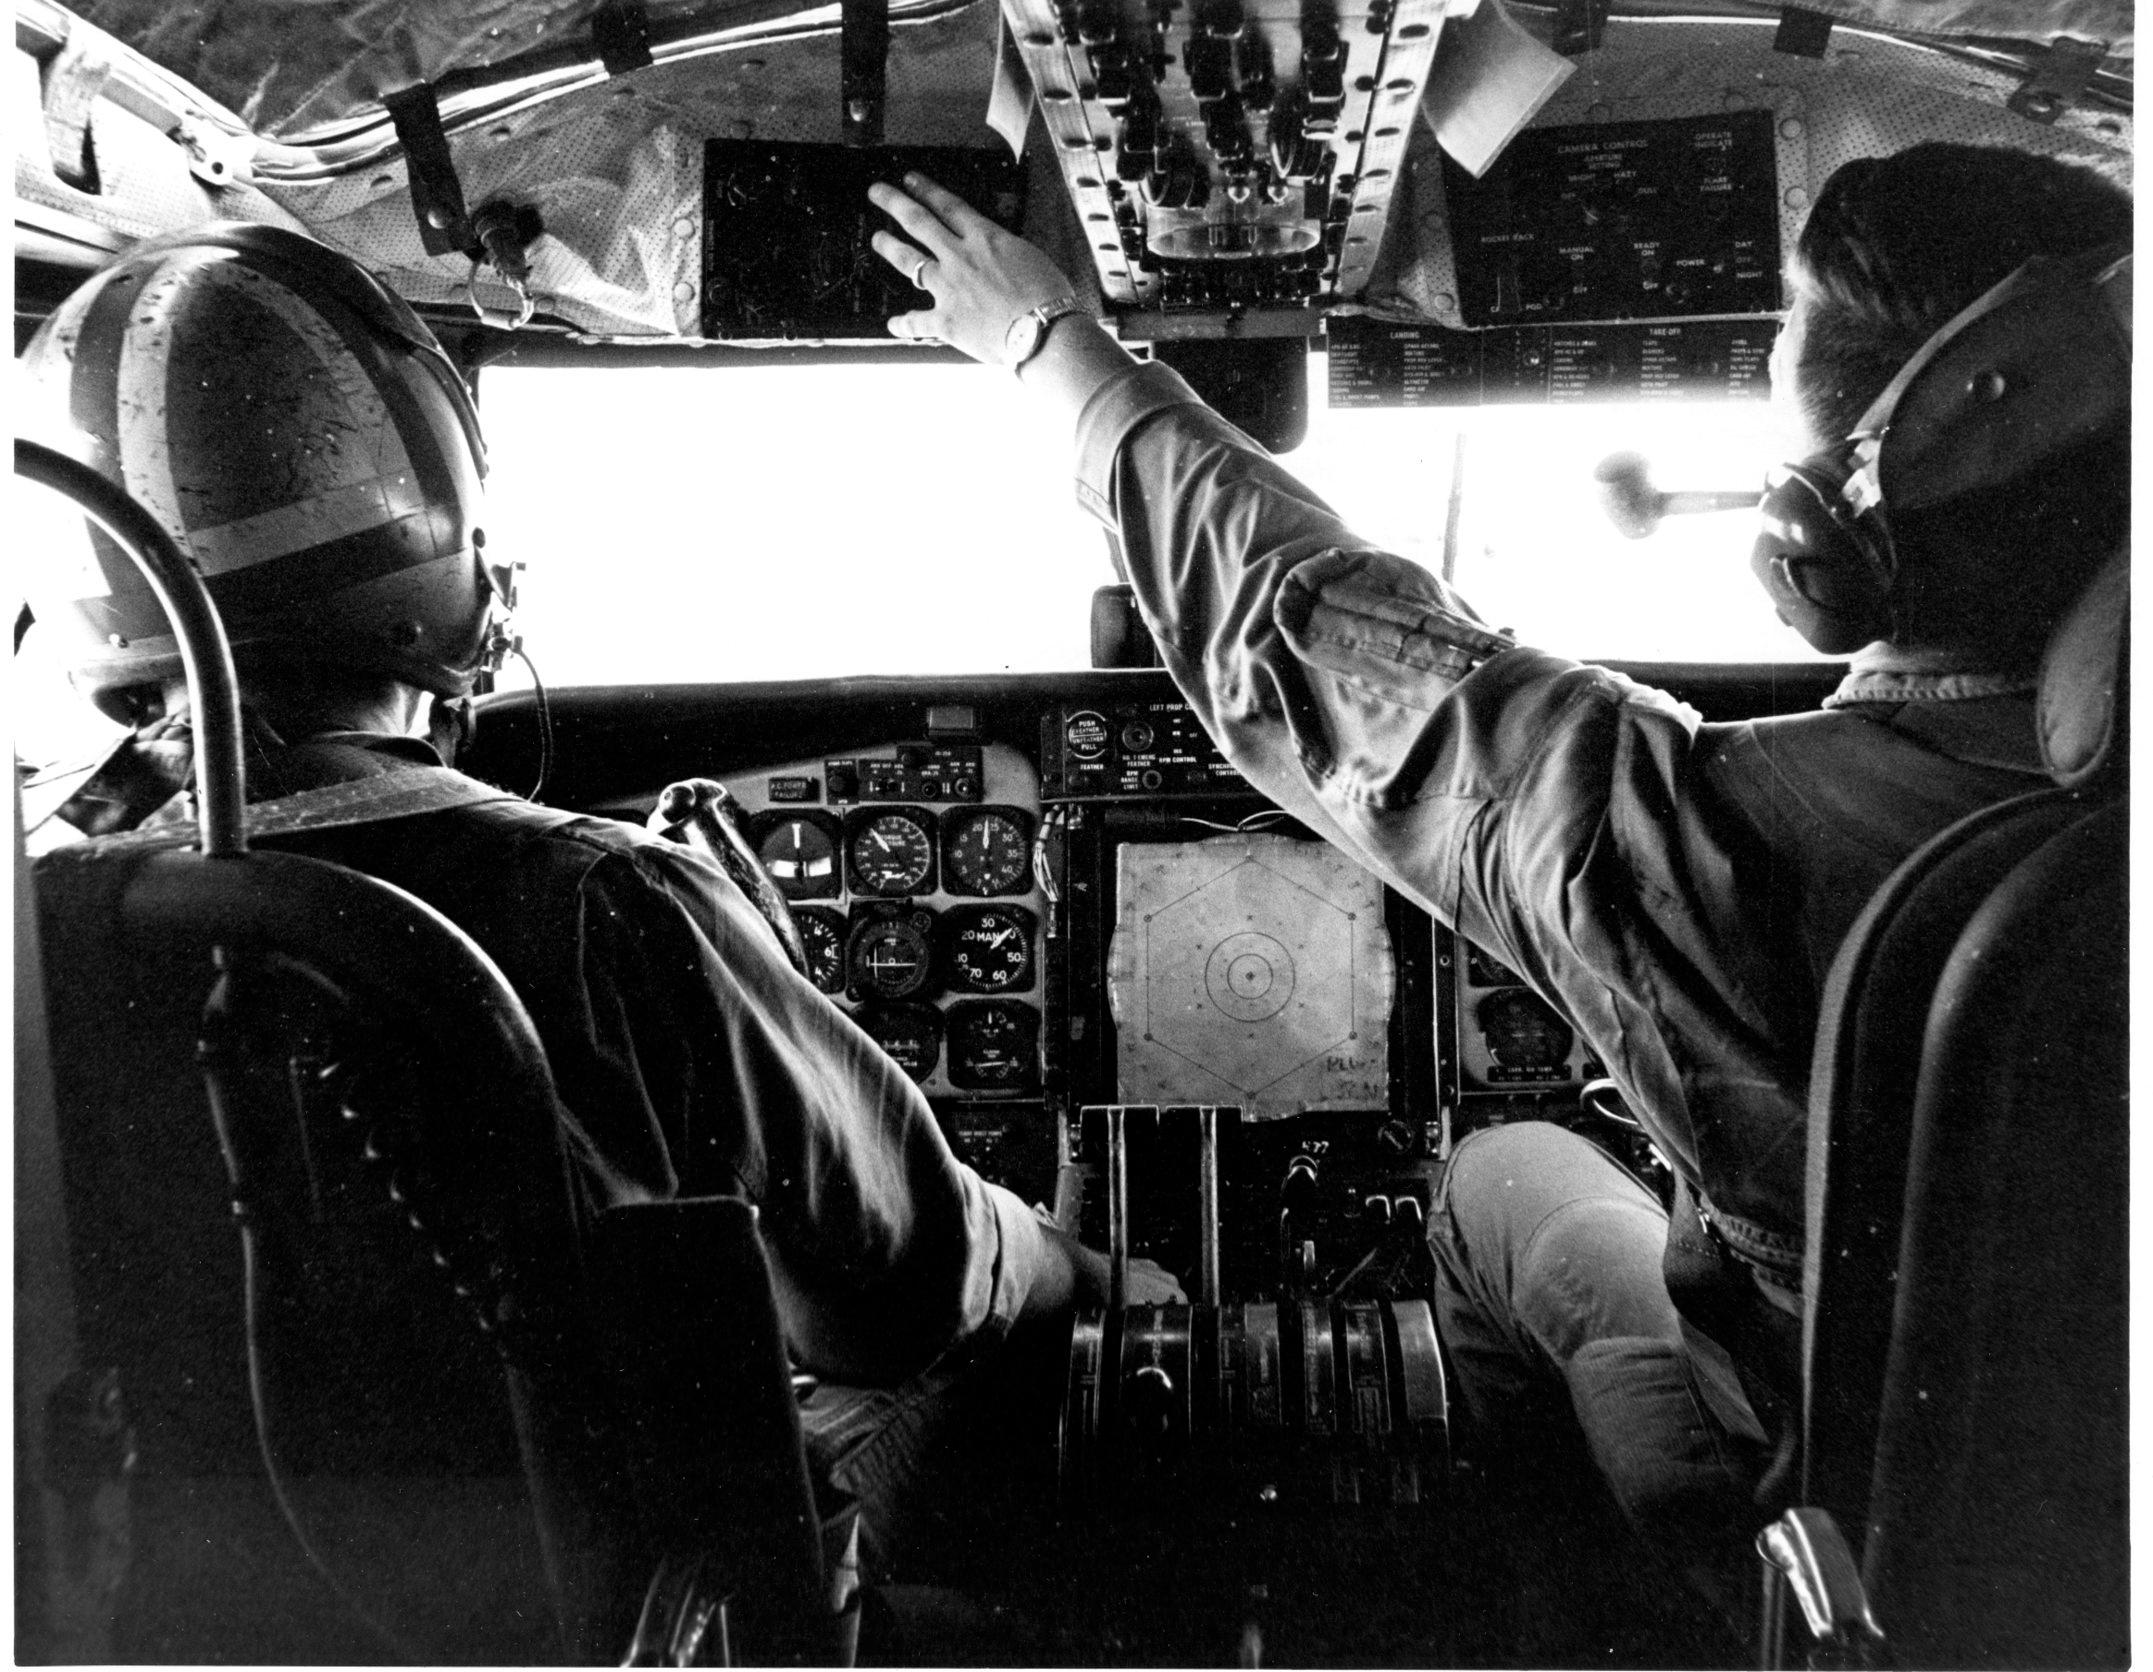 Marlin pilots